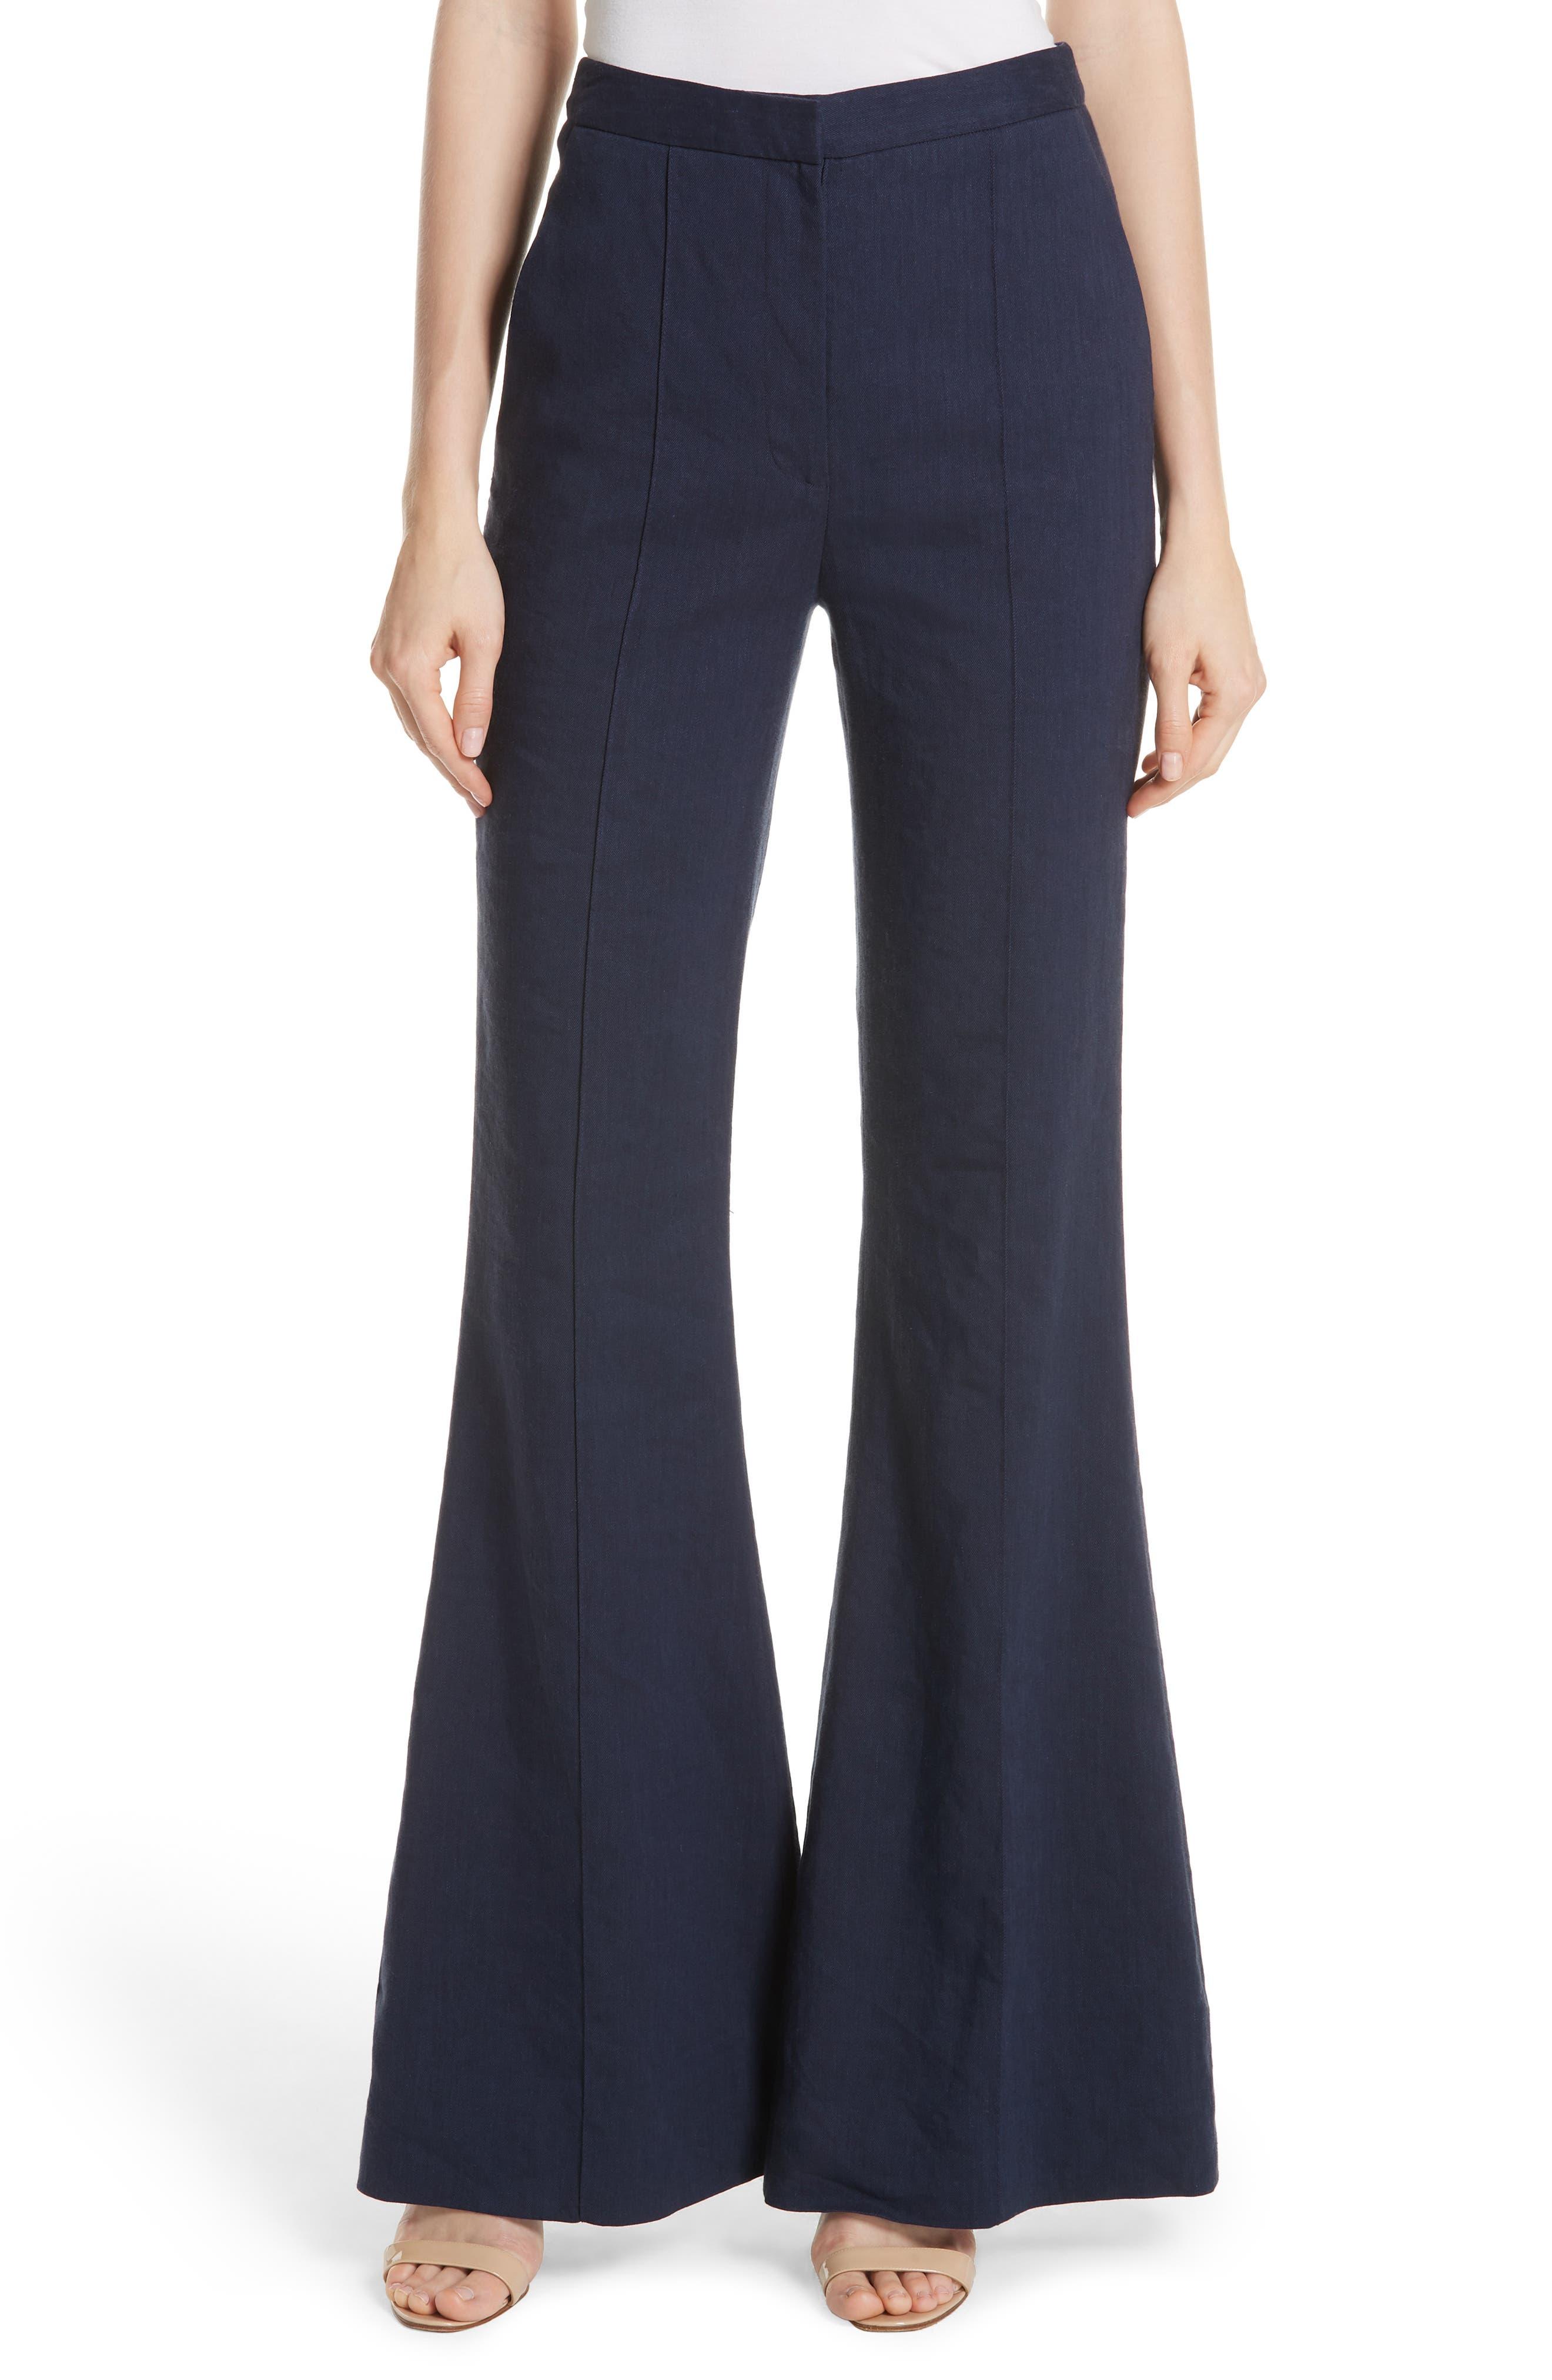 Diane von Furstenberg Pleat Front Flare Stretch Linen Blend Pants,                         Main,                         color, New Navy